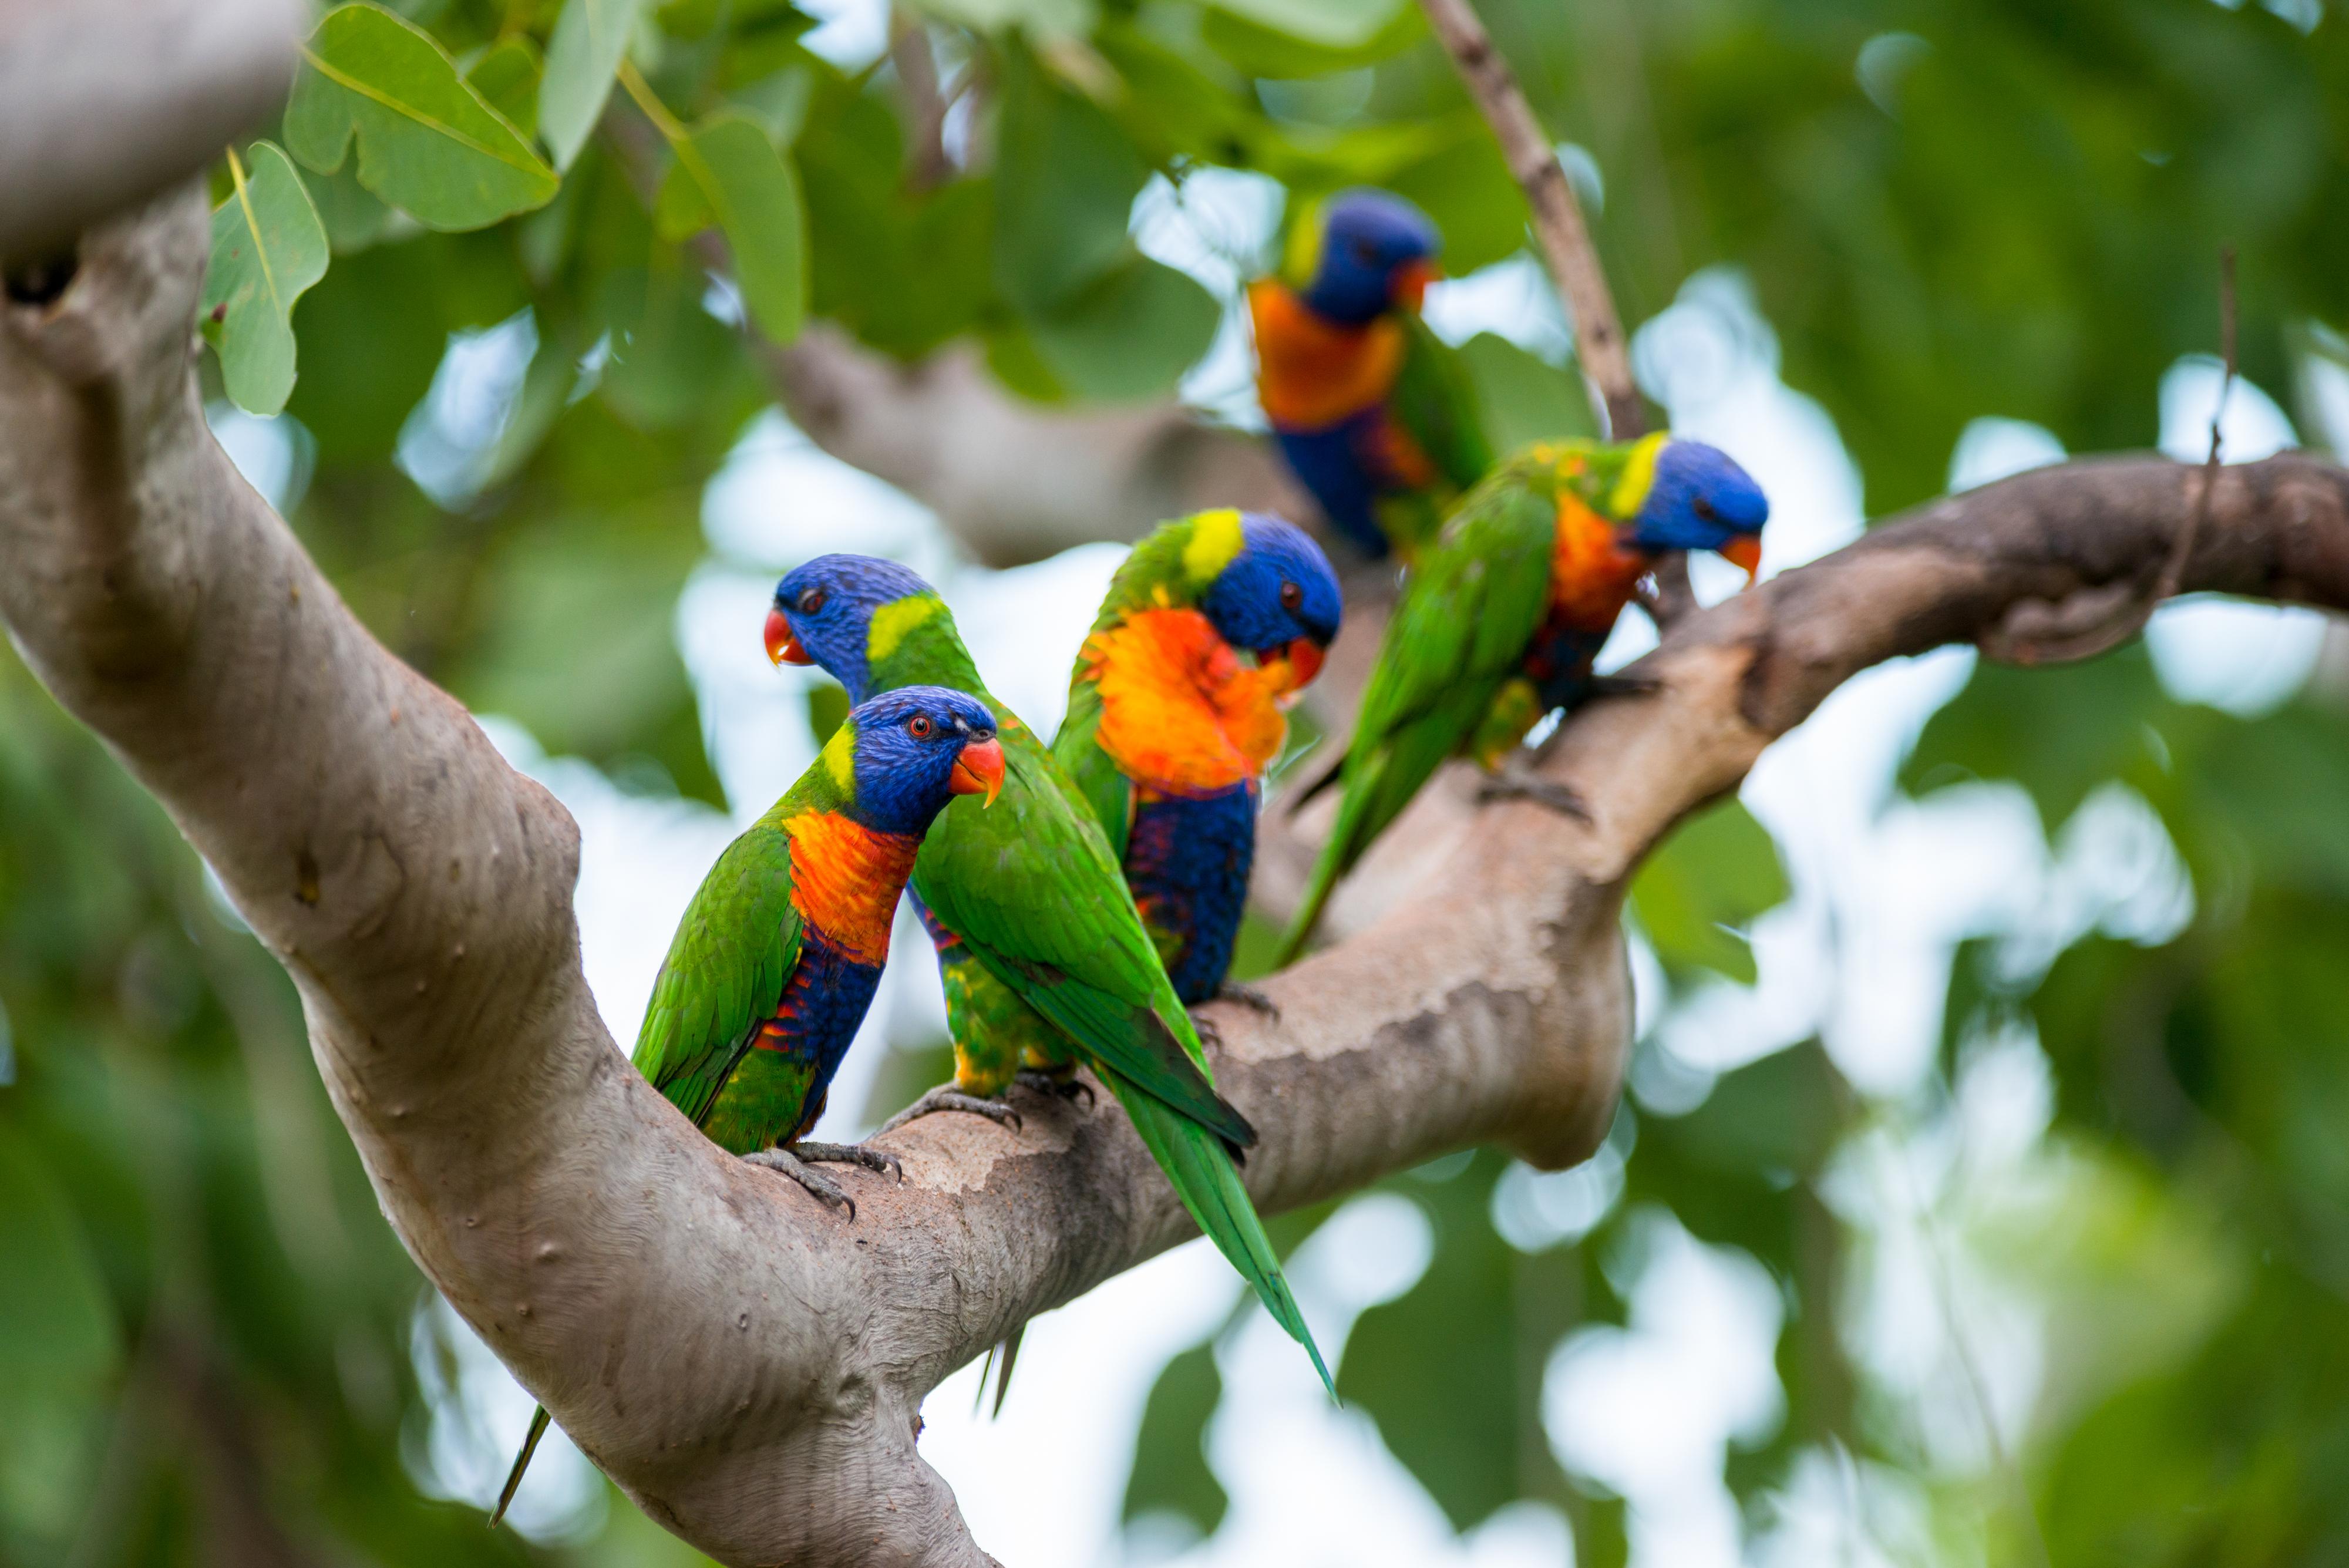 https://www.thalabeach.com.au/wp-content/uploads/2010/07/Thala_Beach_Nature_Reserve_2016__25.jpg